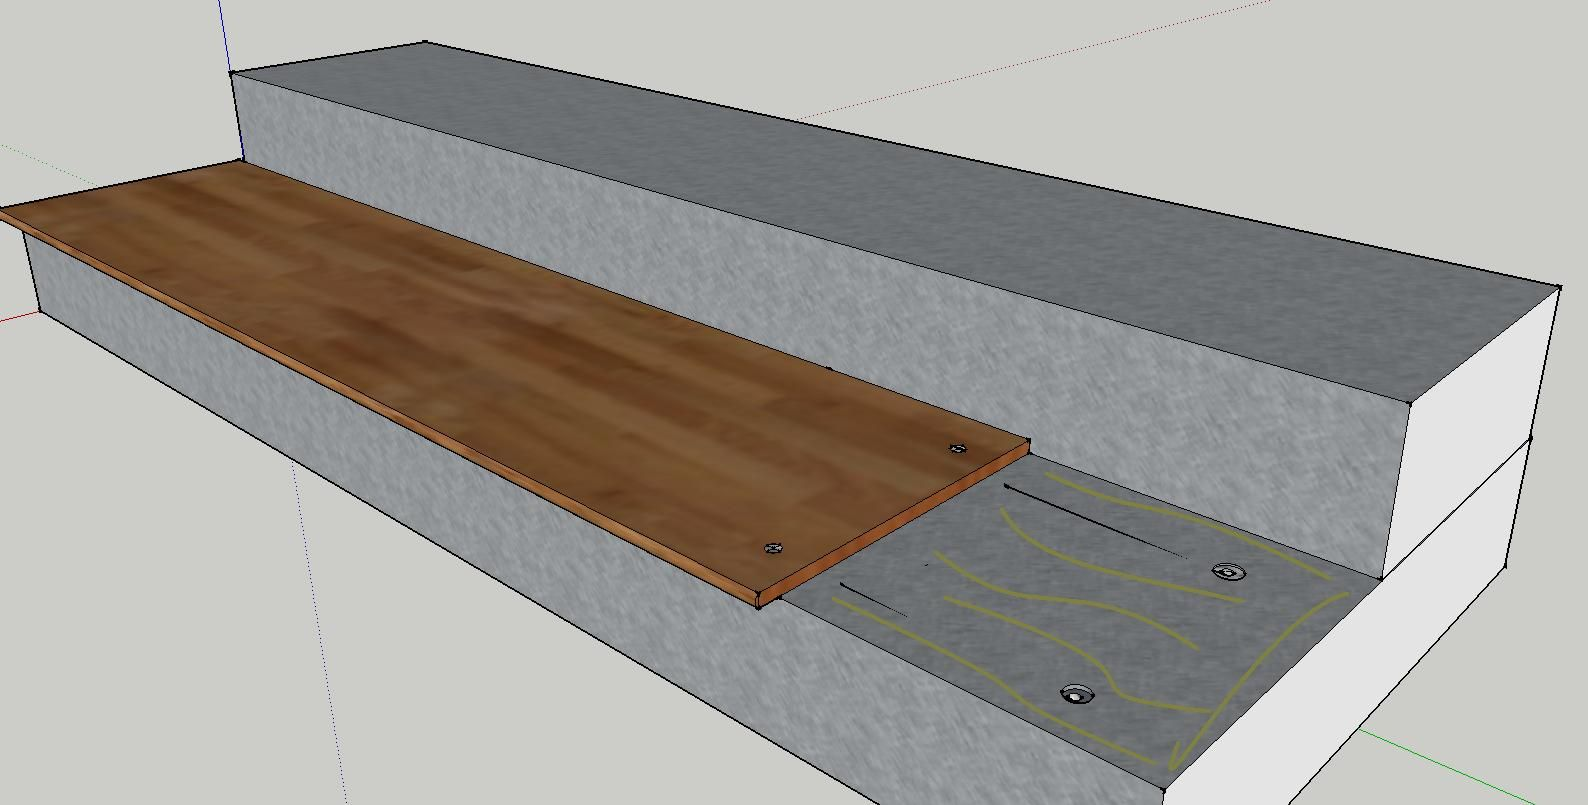 Cover Concrete Steps With Wood Concrete Steps Deck Over | Wood Stairs Over Concrete | Stair Stringers | Composite Decking | Cement | Front Porch | Stoop